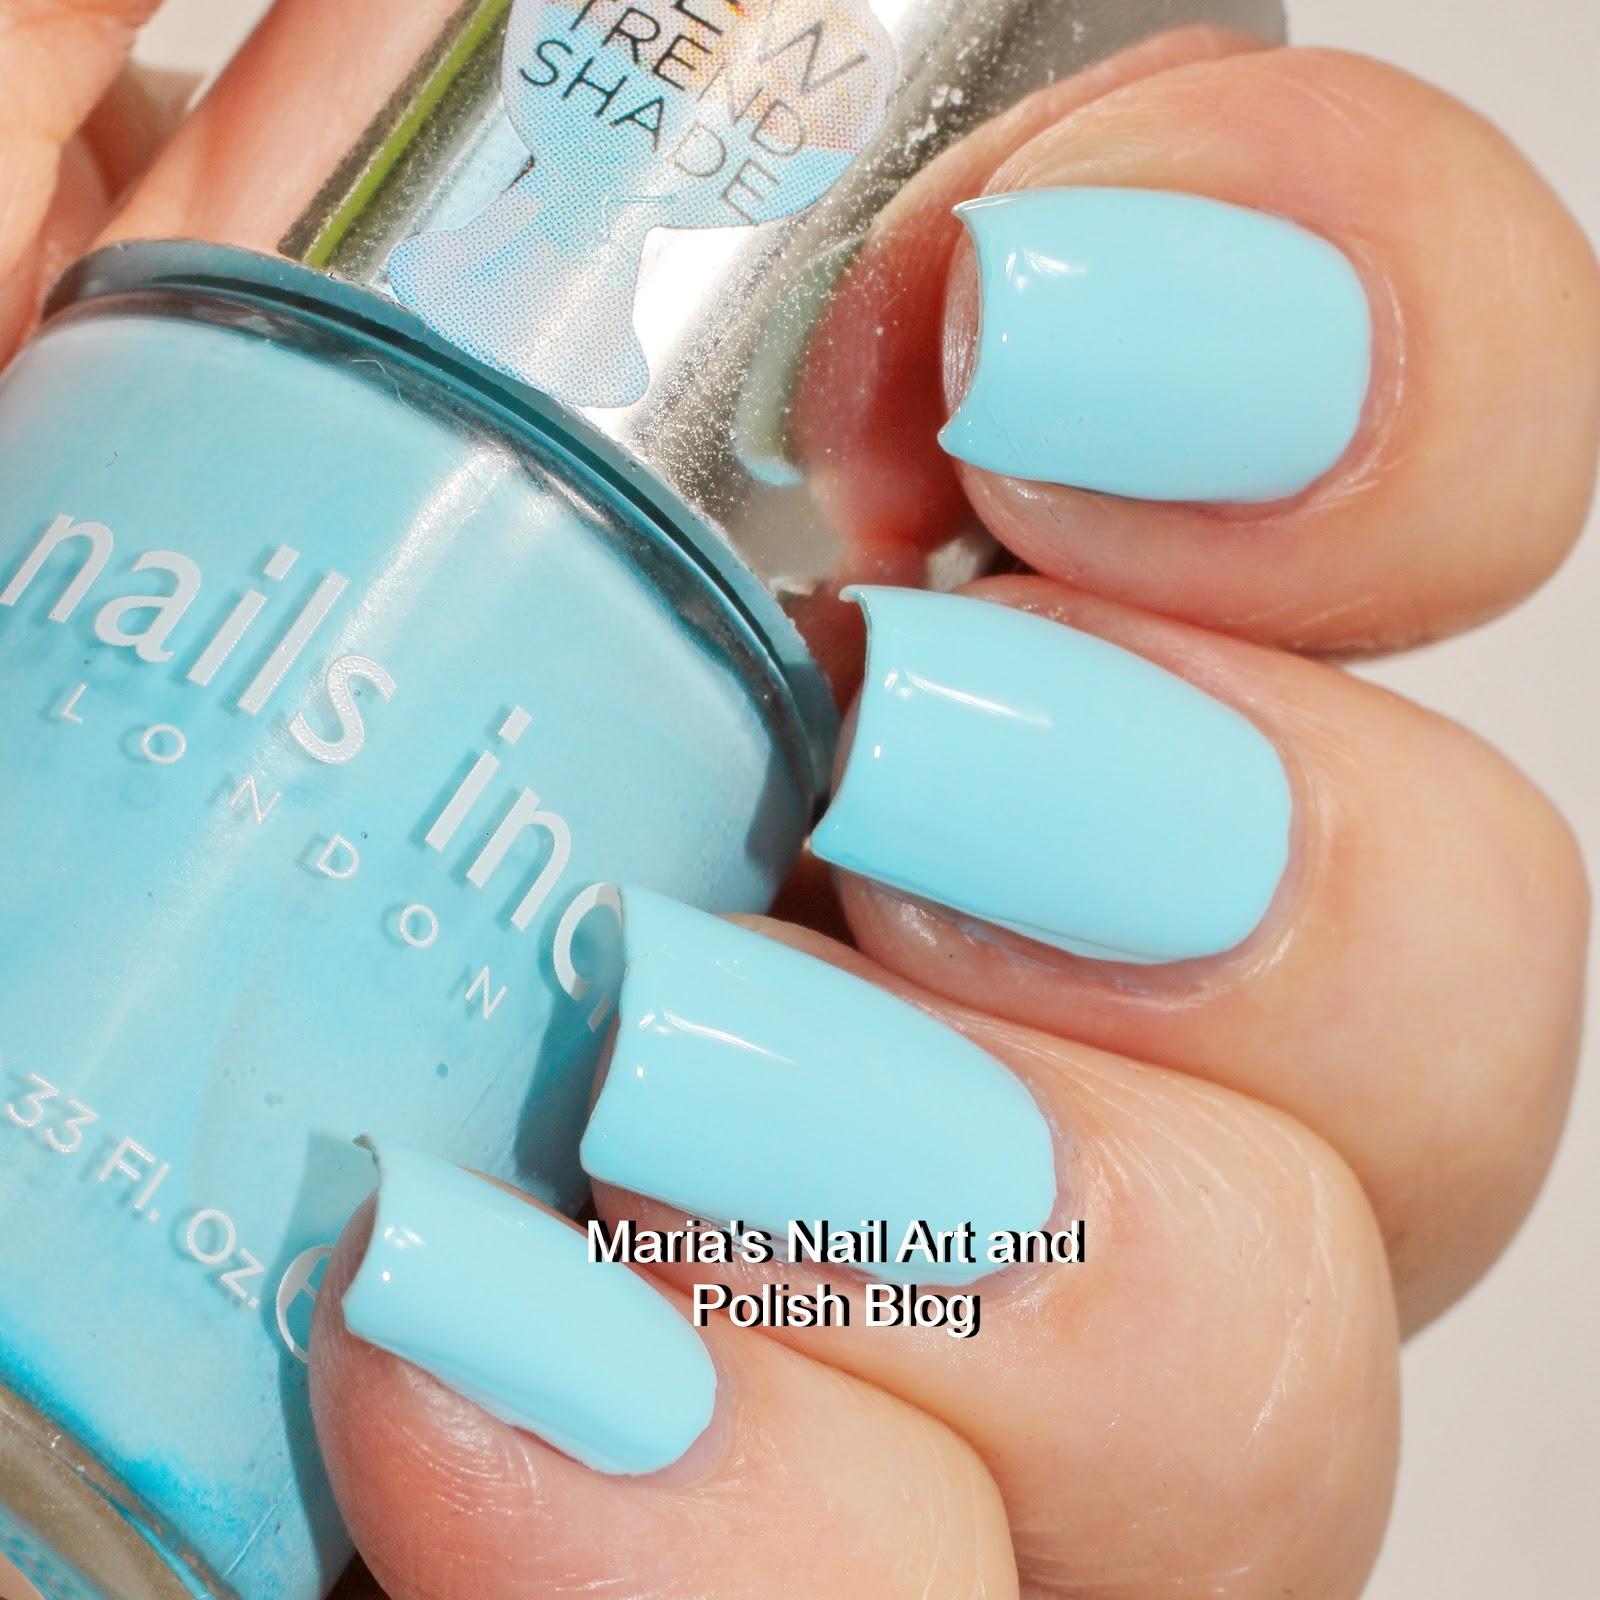 Marias Nail Art and Polish Blog: Nails Inc. Chelsea Physic Garden + ...